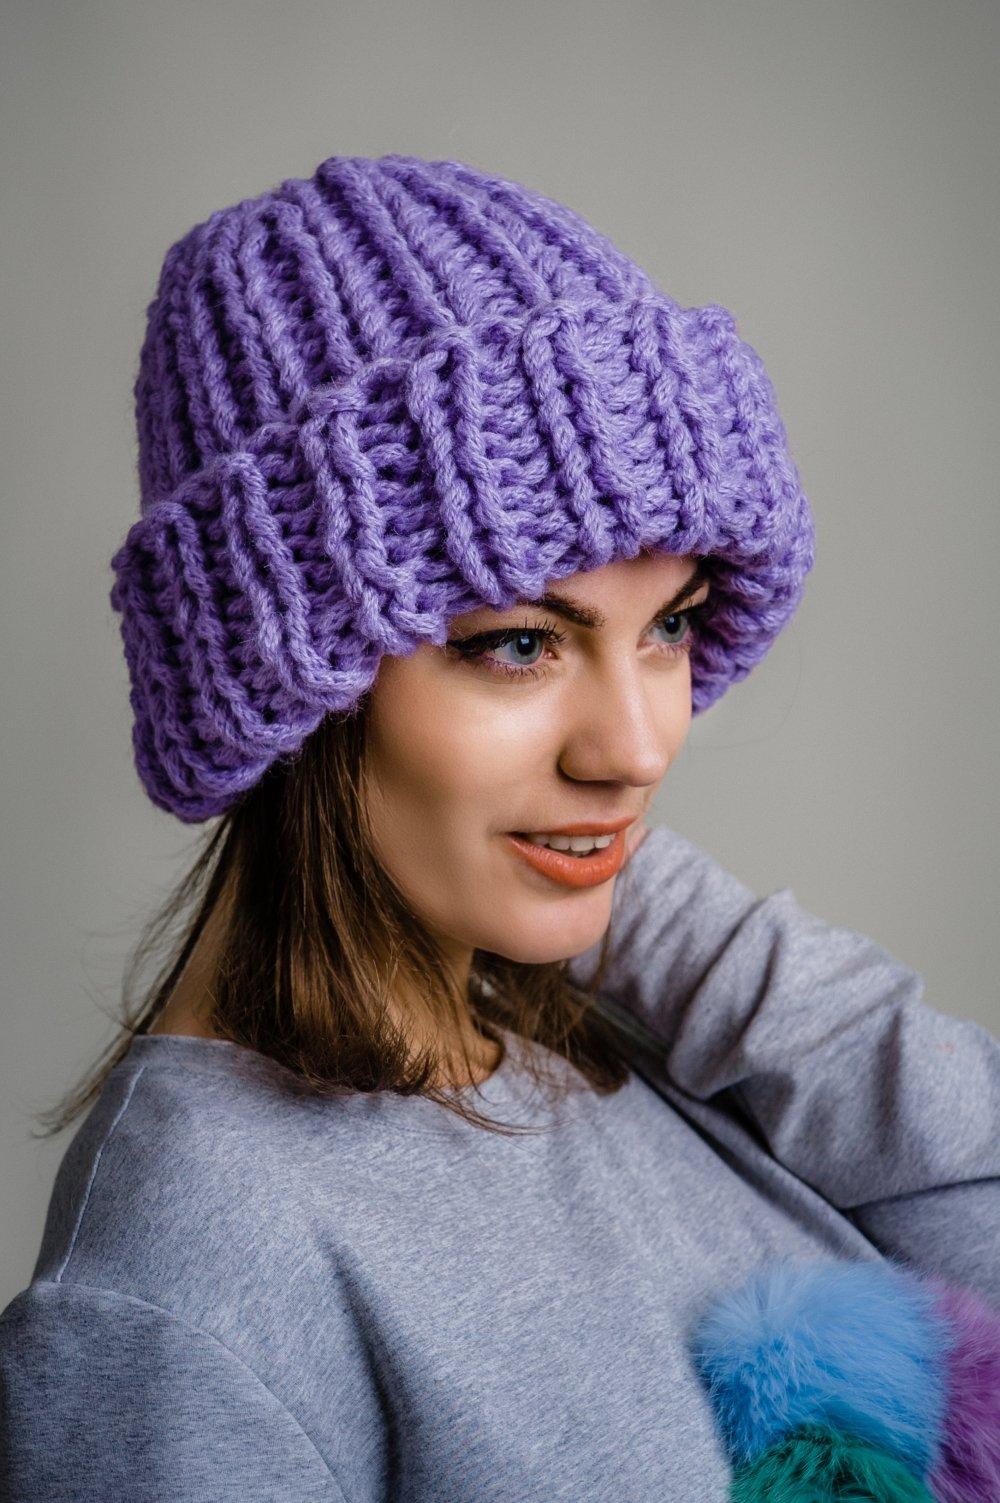 шапка вязаная крупная вязка фото